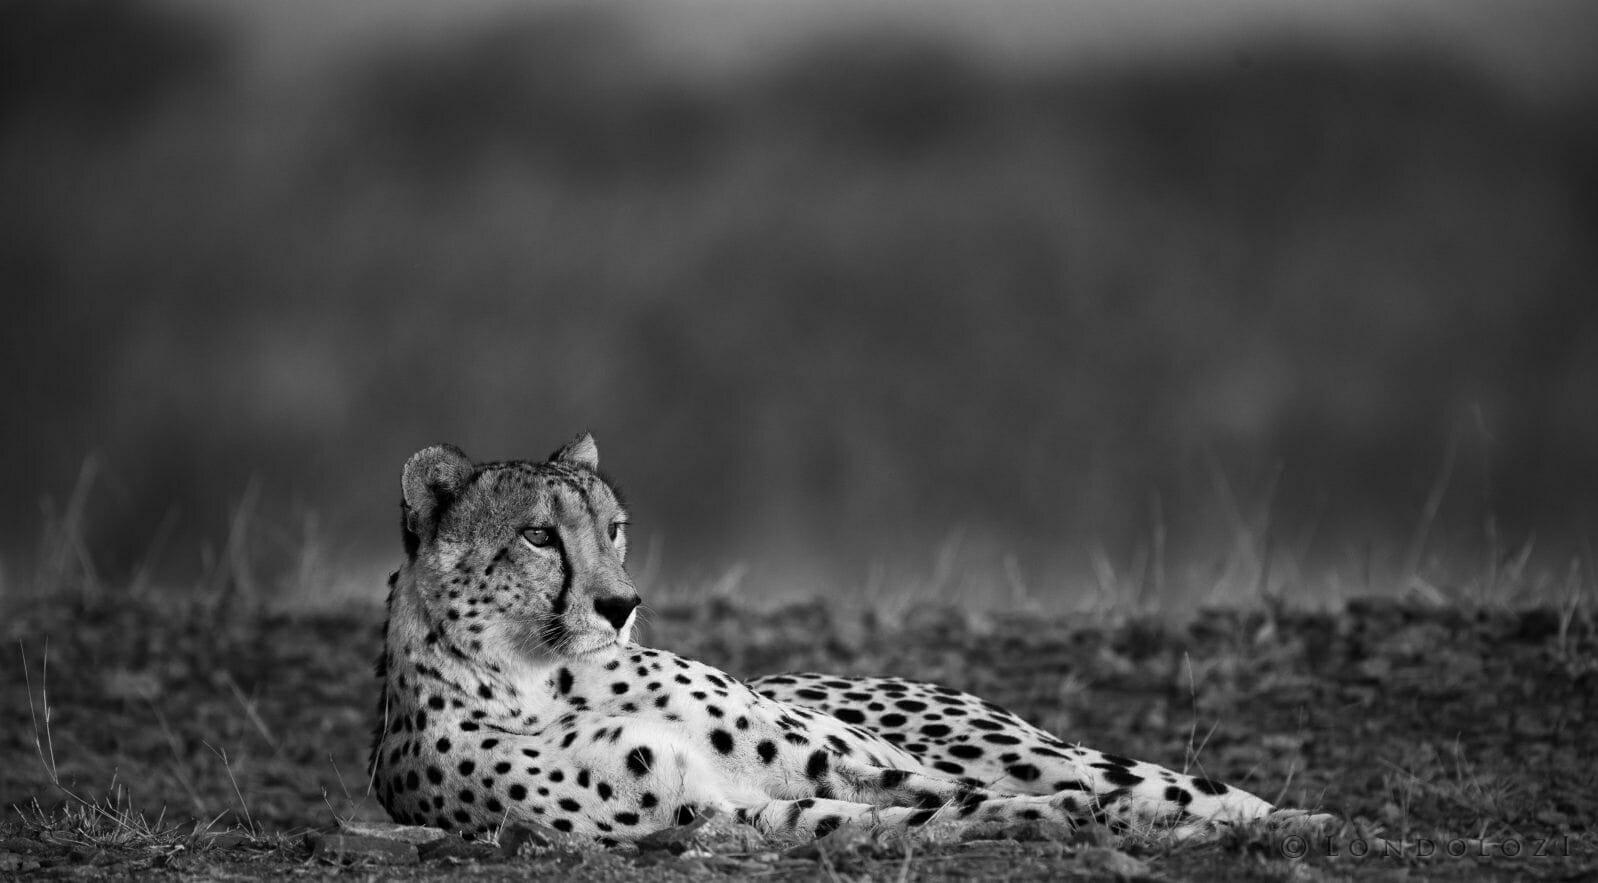 Bnw Cheetah Lying Railway 2 Face1